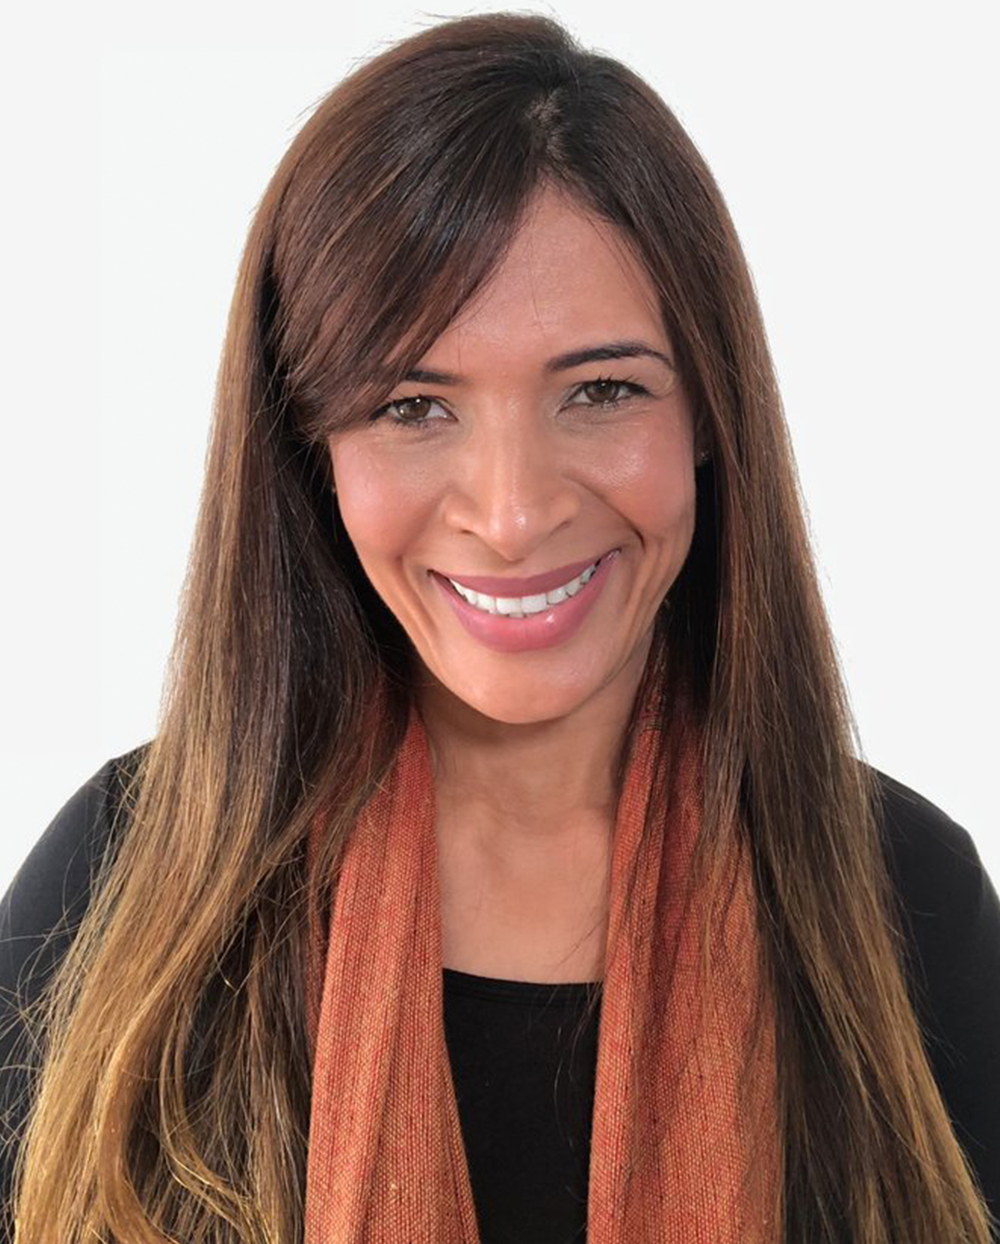 Valeria Teles: Motivational & Fitness Speaker - Florida and New York Events